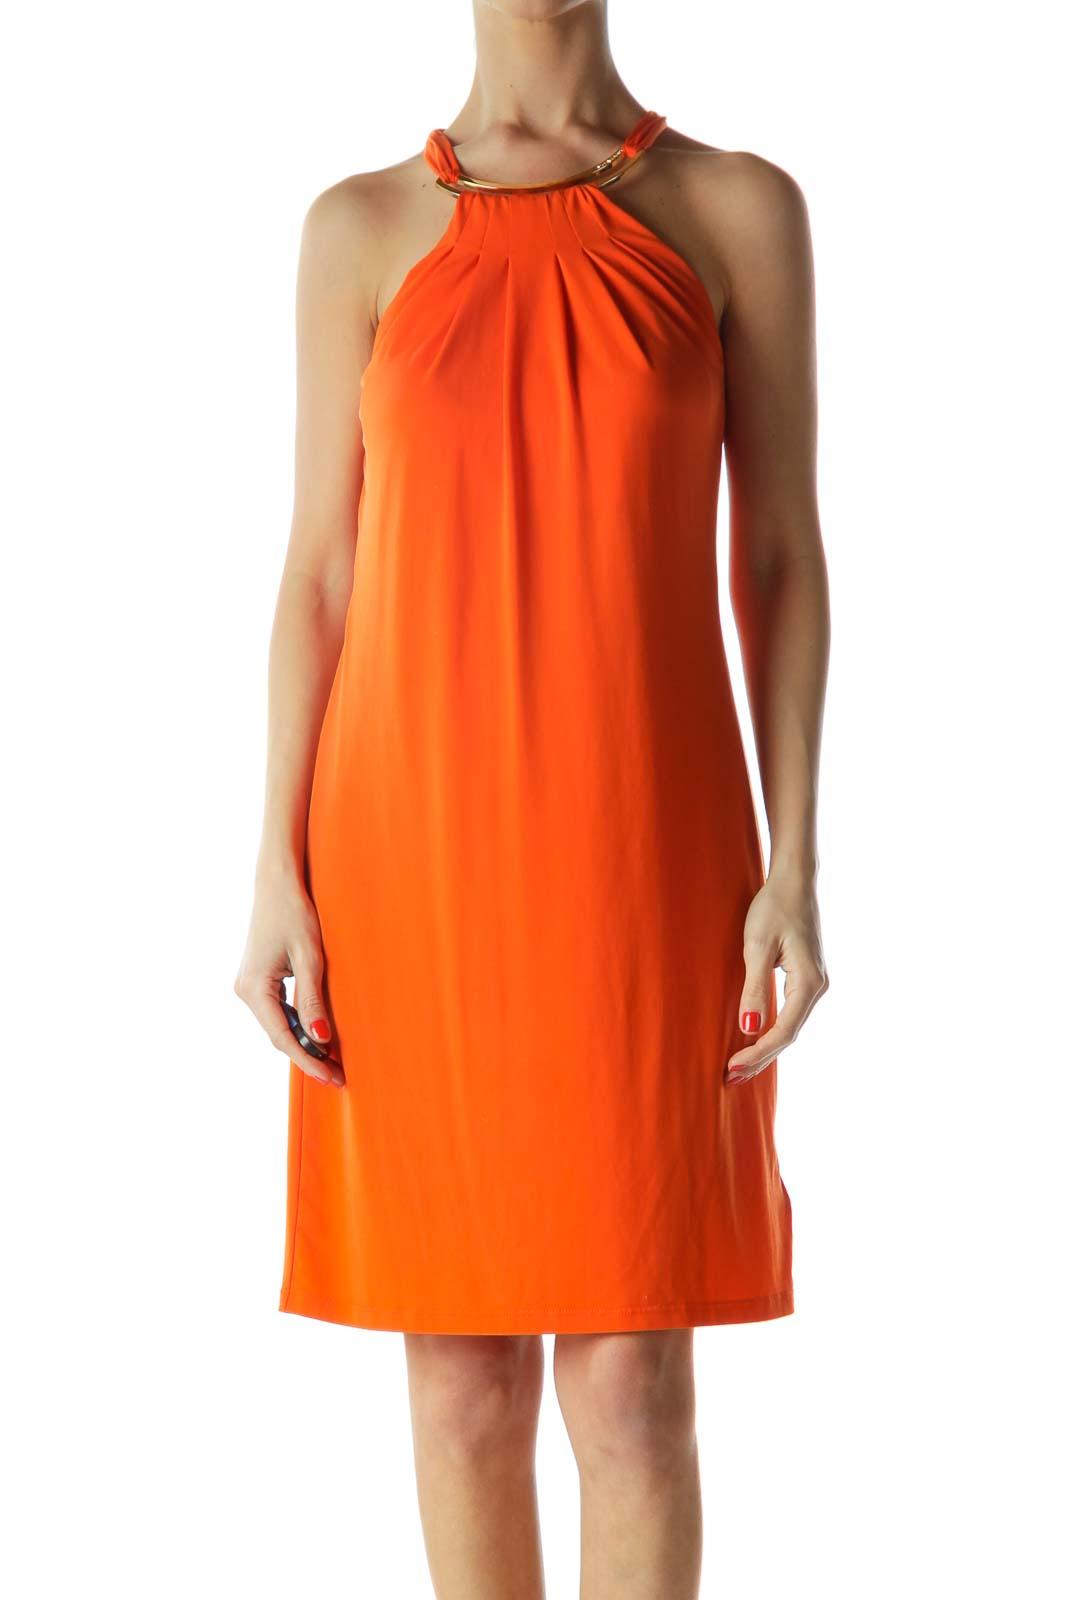 91a66796b18 Shop Orange Metal Trim Tent Dress clothing and handbags at SilkRoll ...